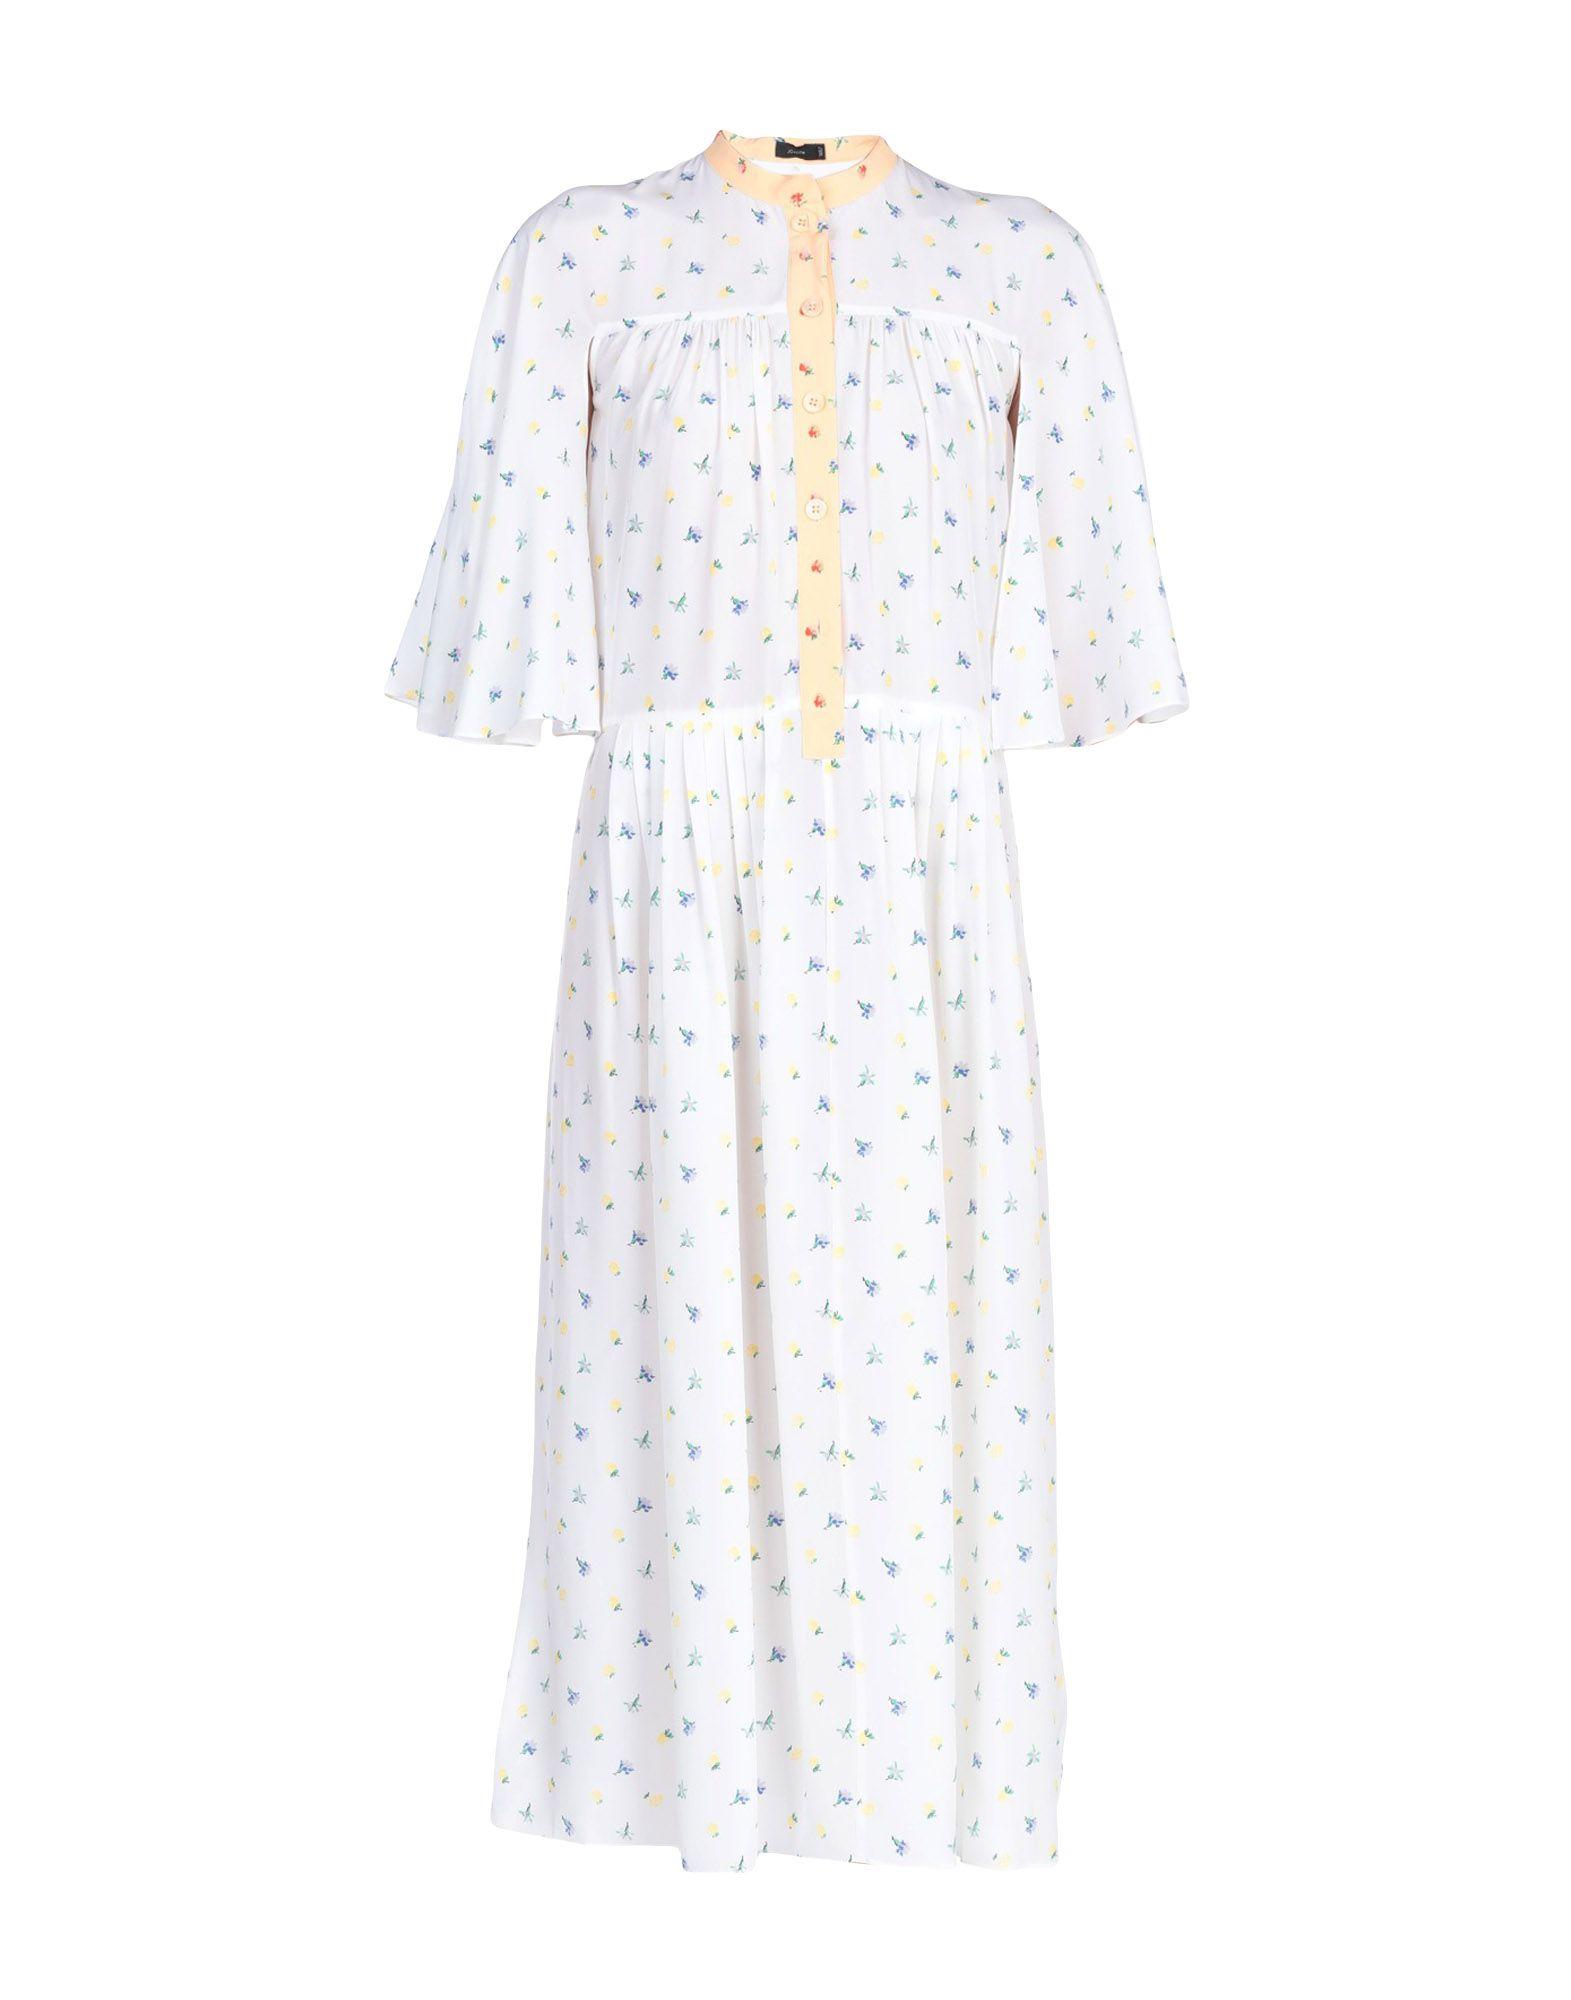 JOSEPH Платье длиной 3/4 icons платье длиной 3 4